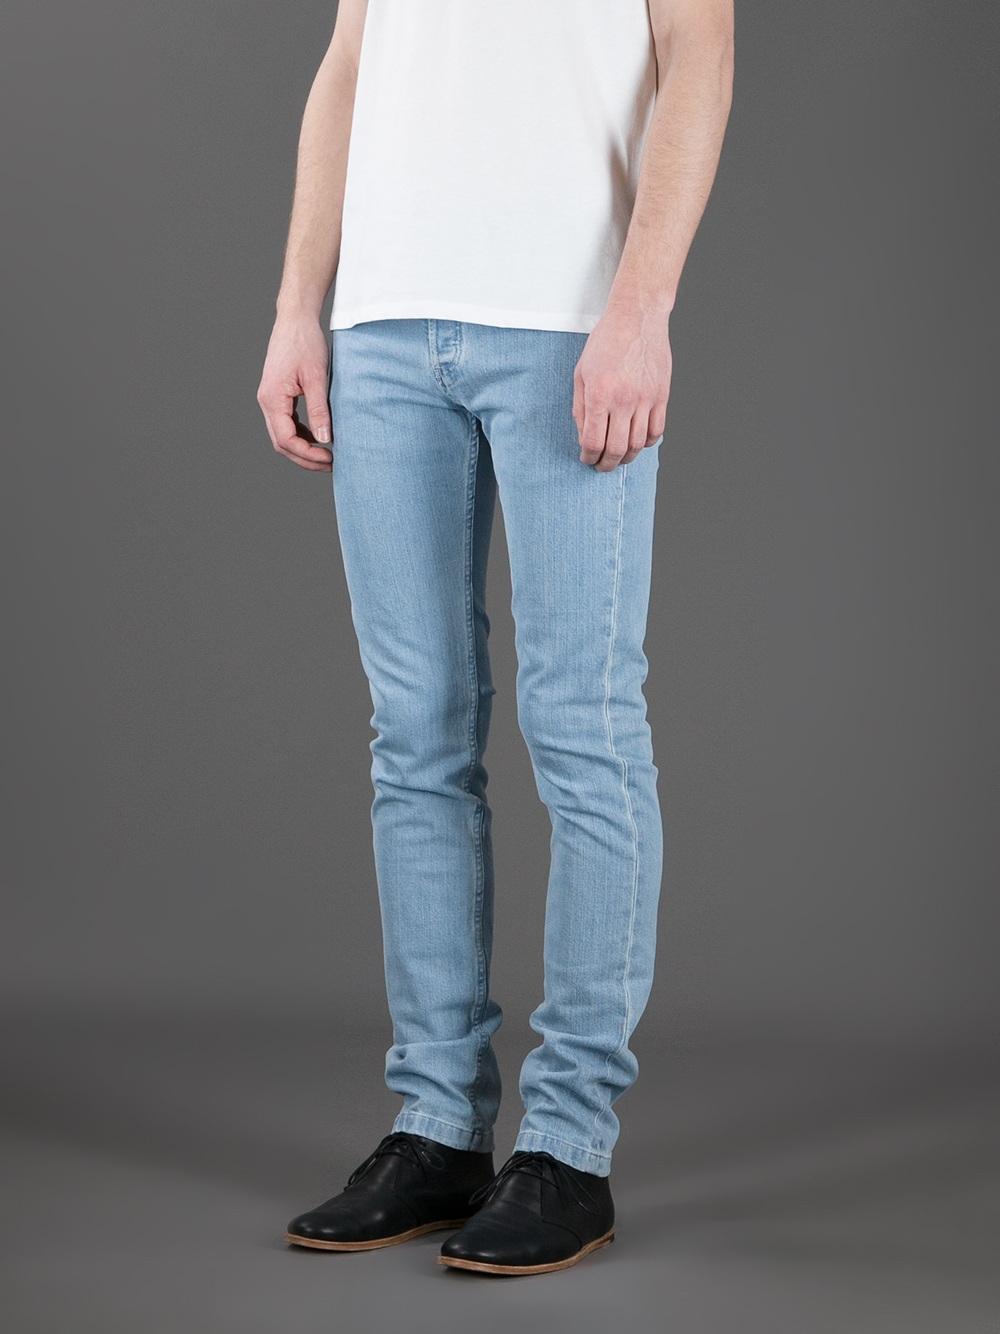 lyst a p c petit new standard jean in blue for men. Black Bedroom Furniture Sets. Home Design Ideas